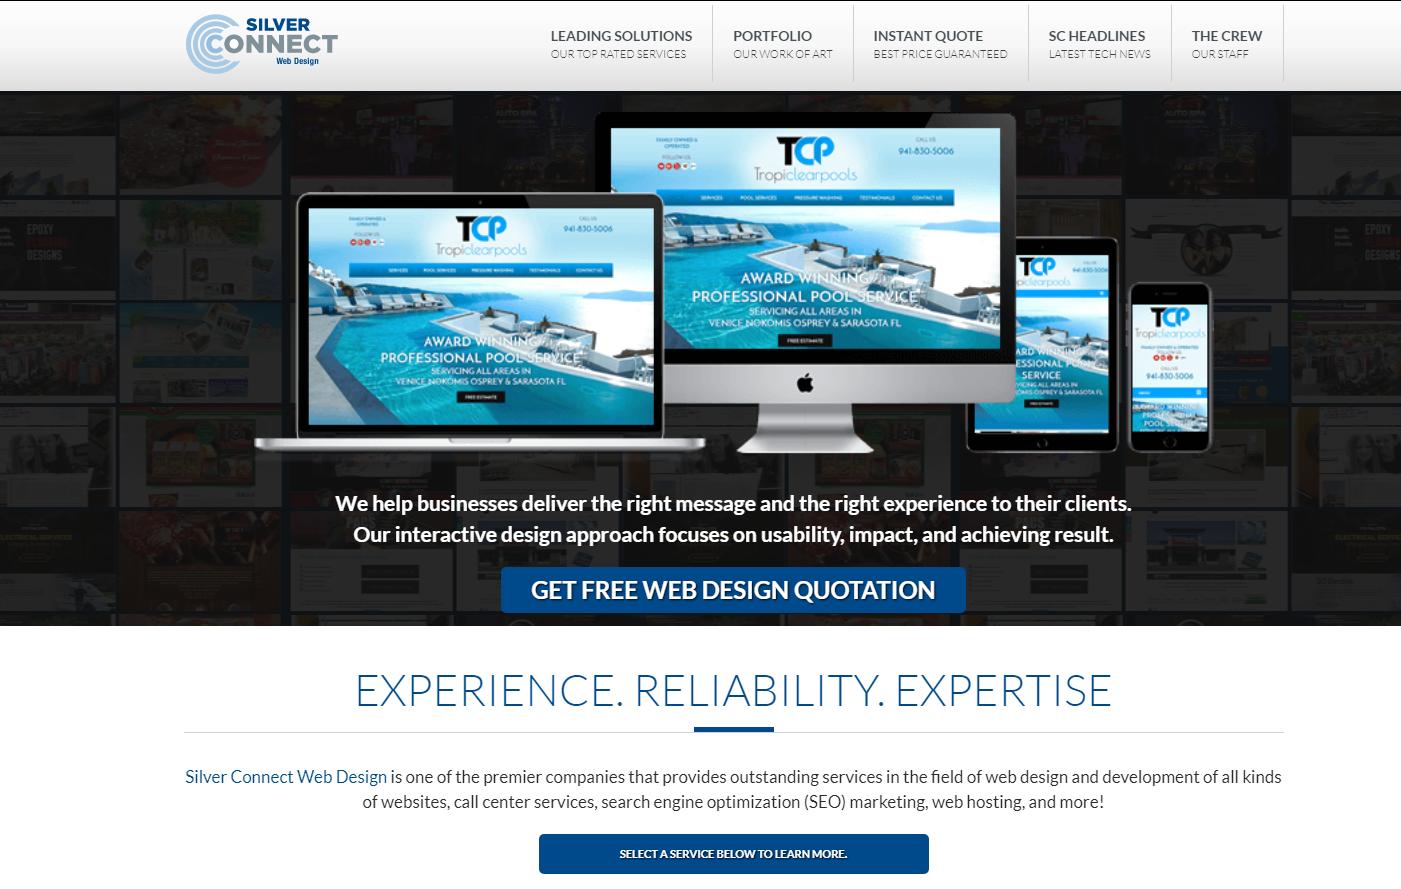 About Silver Connect Web Design Web Design Free Web Design Affordable Website Design